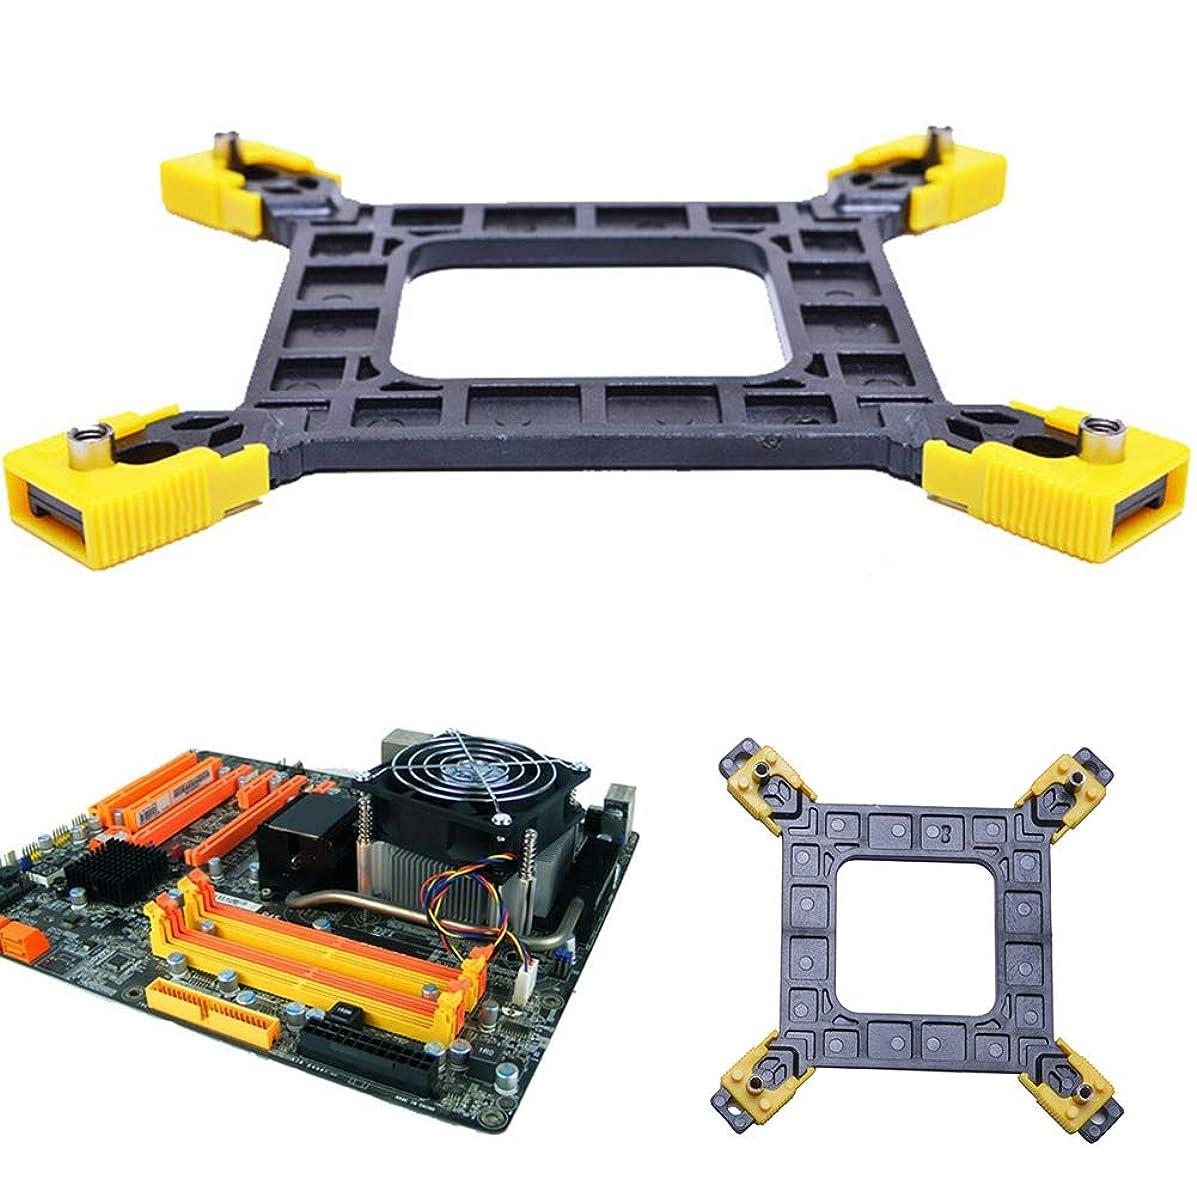 putdWH99 PC Accessories | Desktop Computer CPU Heatsink Backplate Mounting Bracket for Intel G31/G41/945